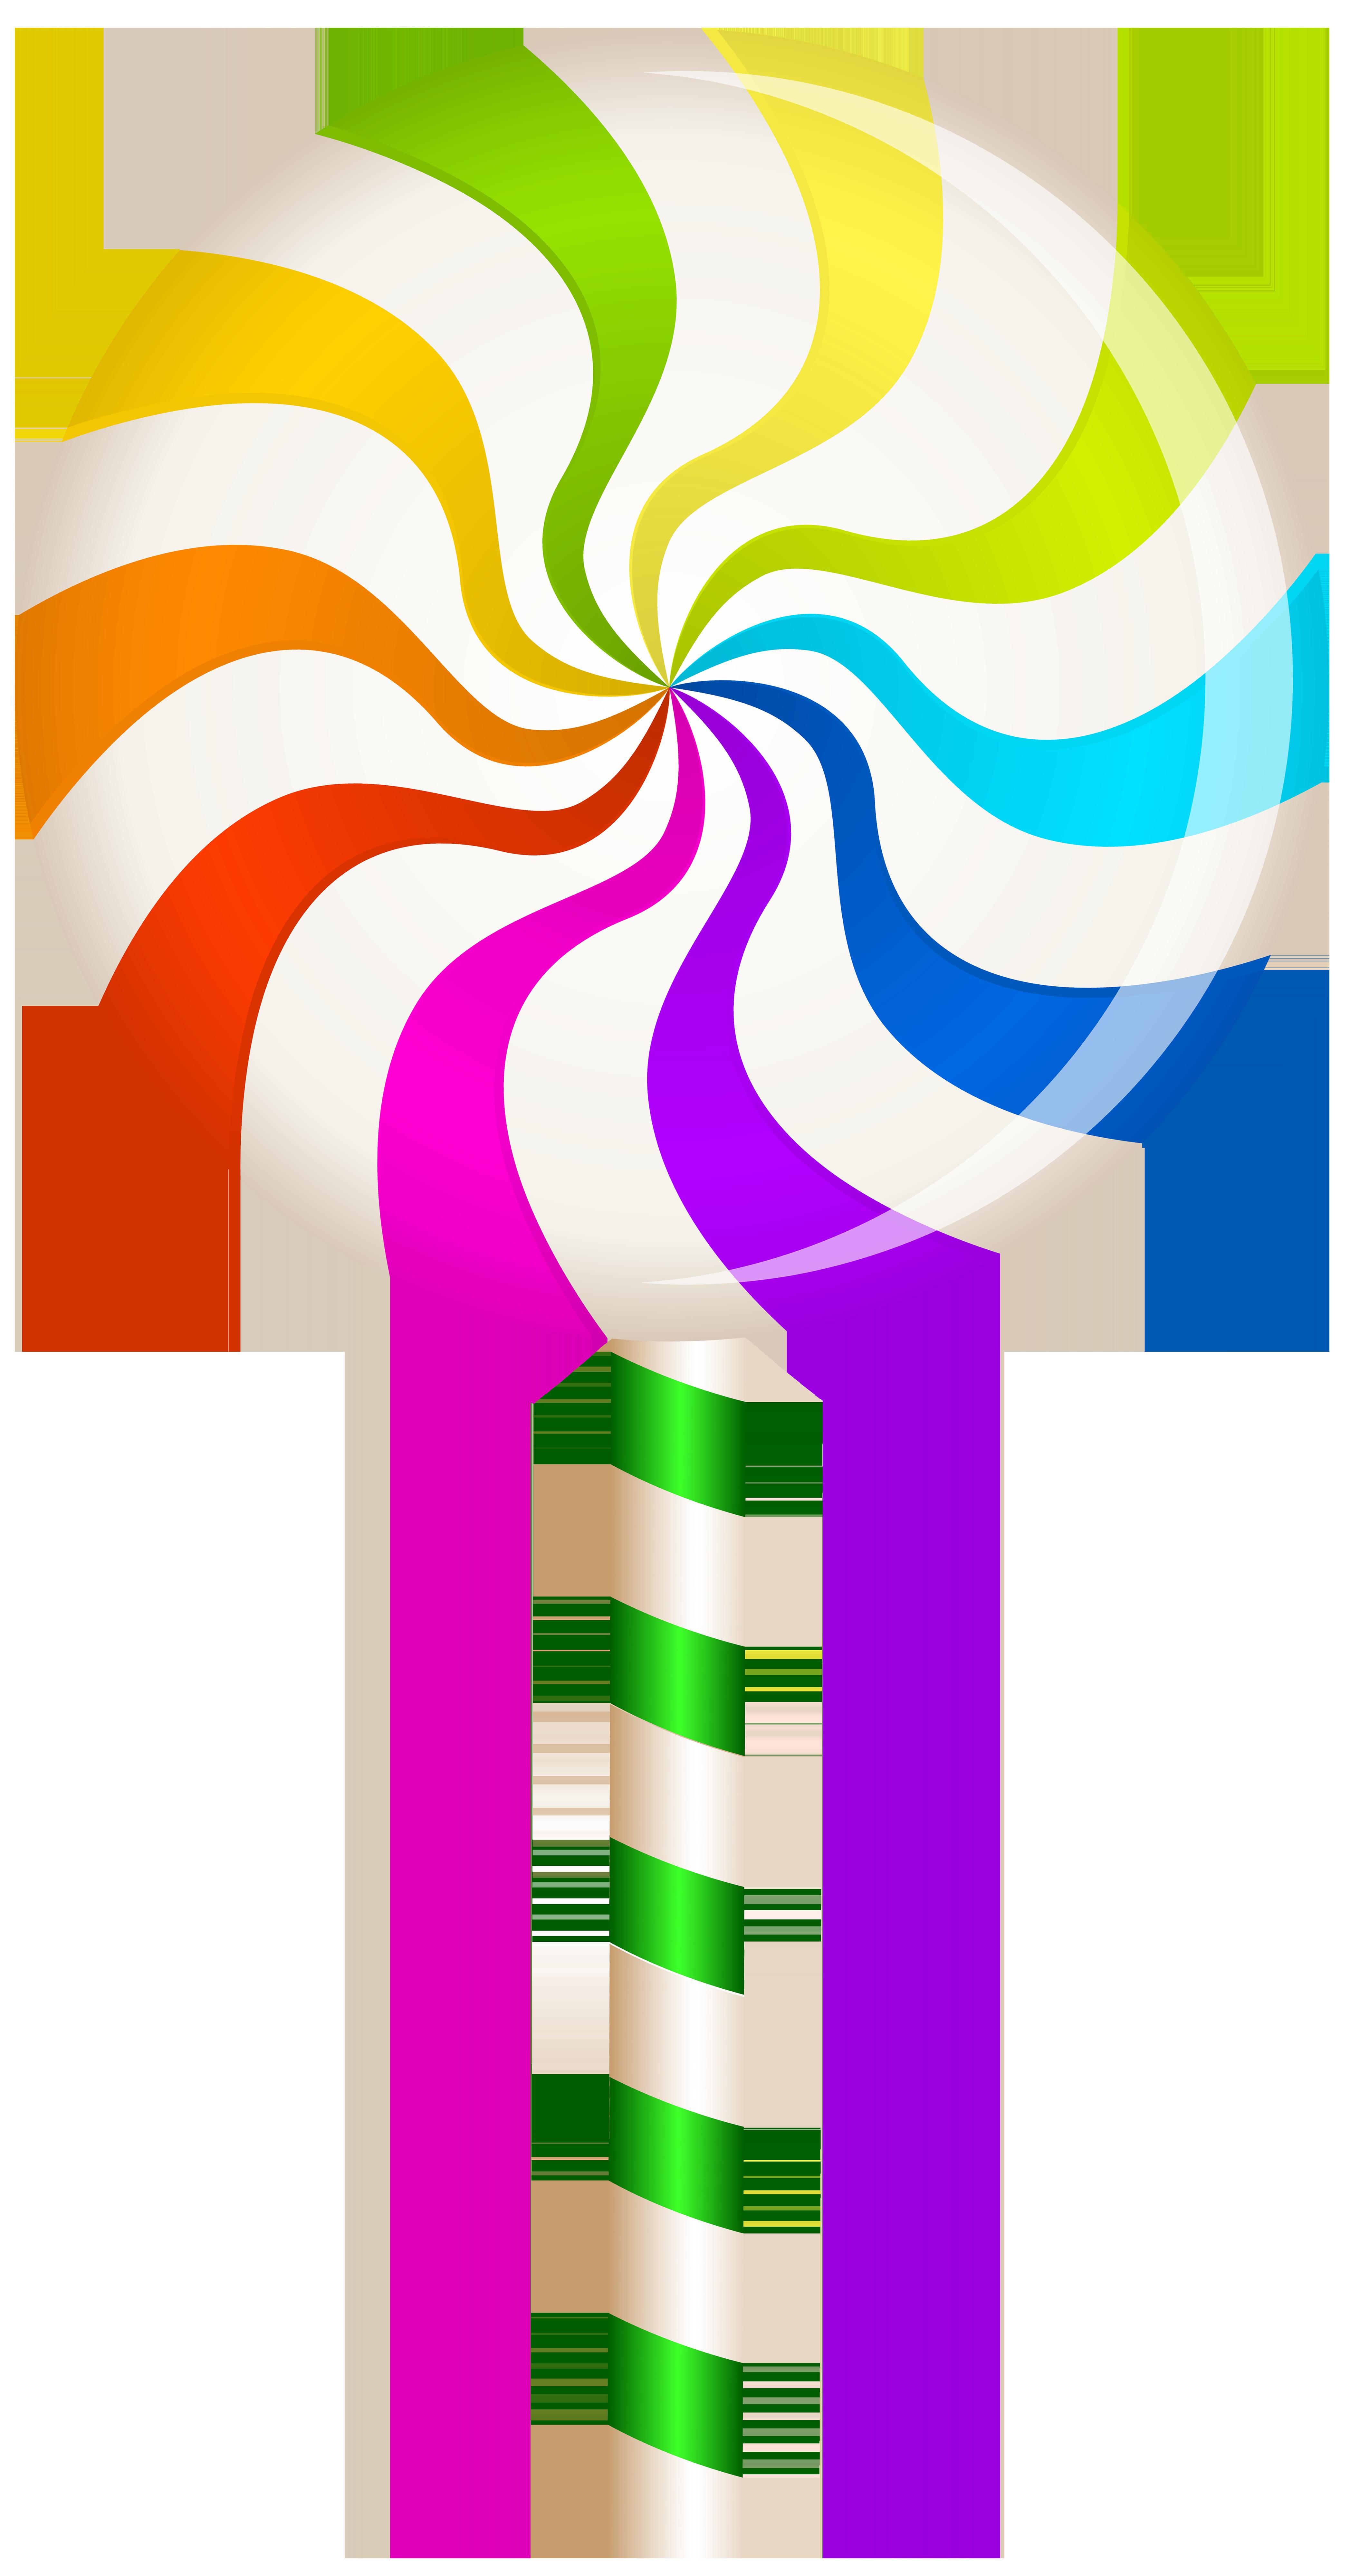 4191x8000 Multicolor Swirl Lollipop Png Clip Art Imageu200b Gallery